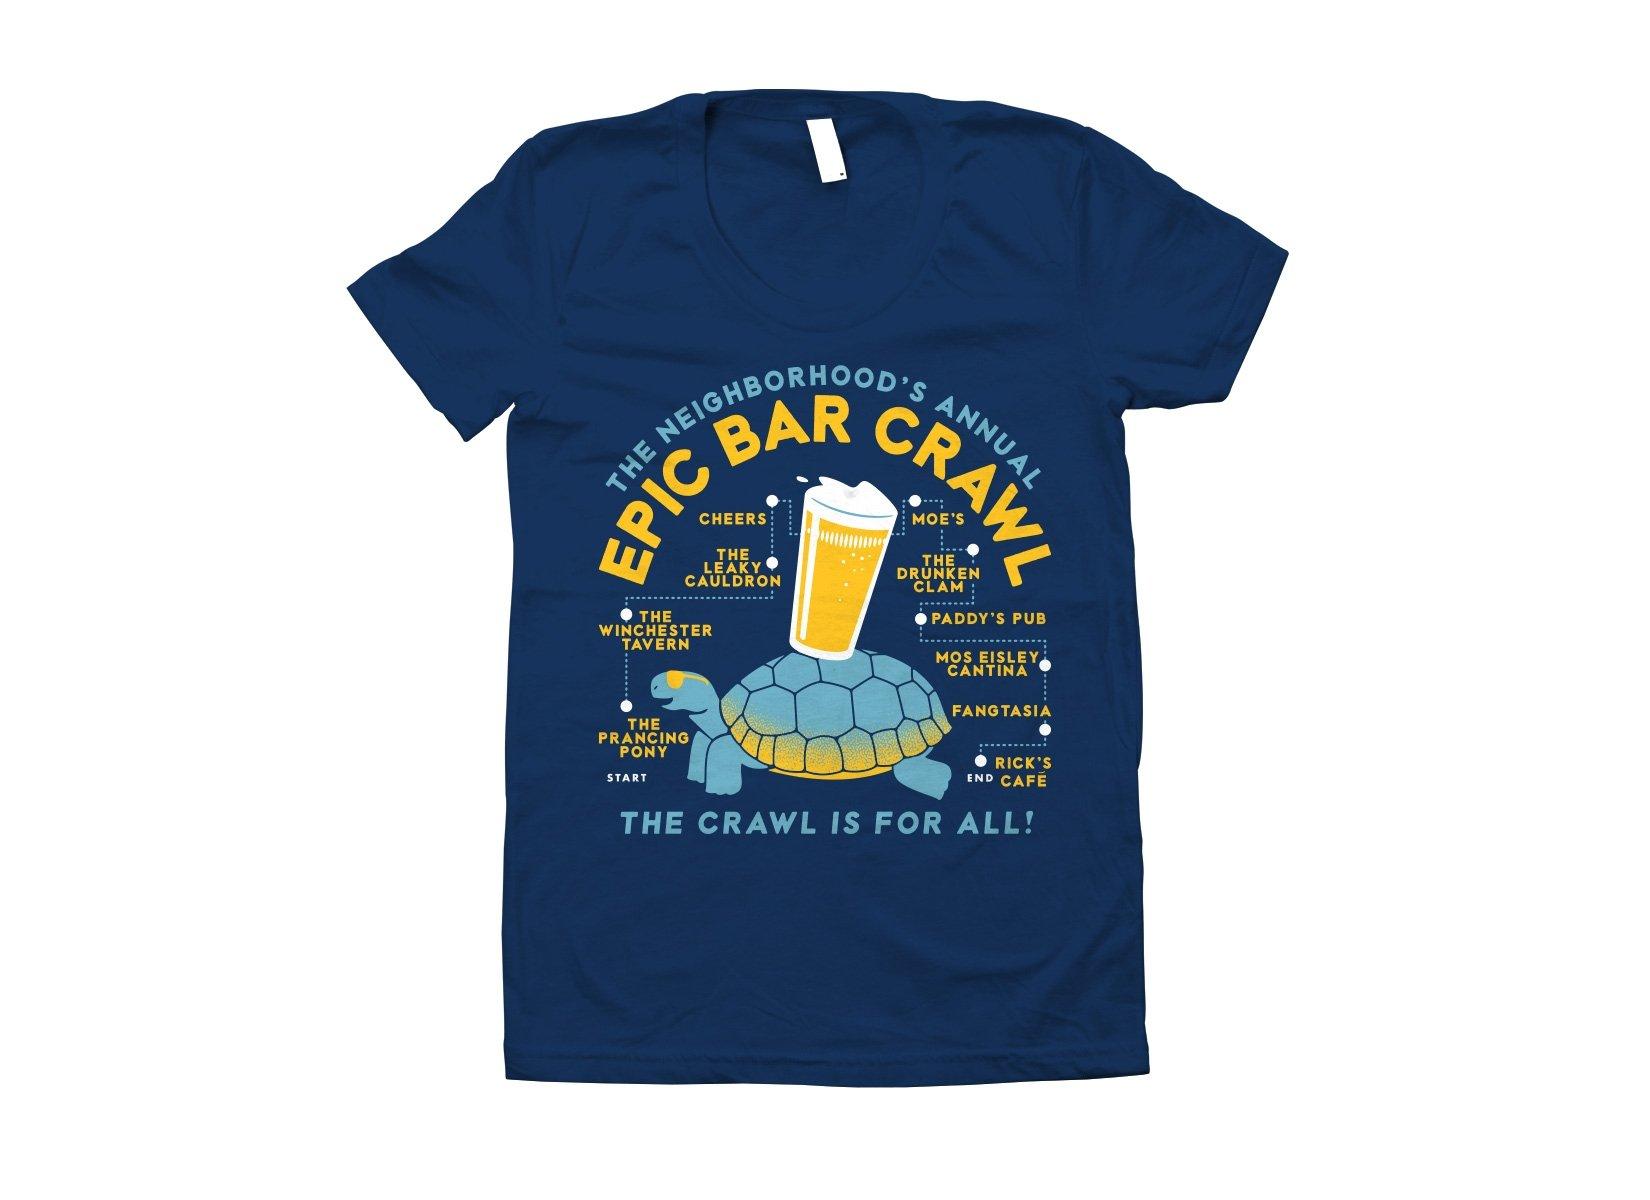 Epic Bar Crawl on Juniors T-Shirt